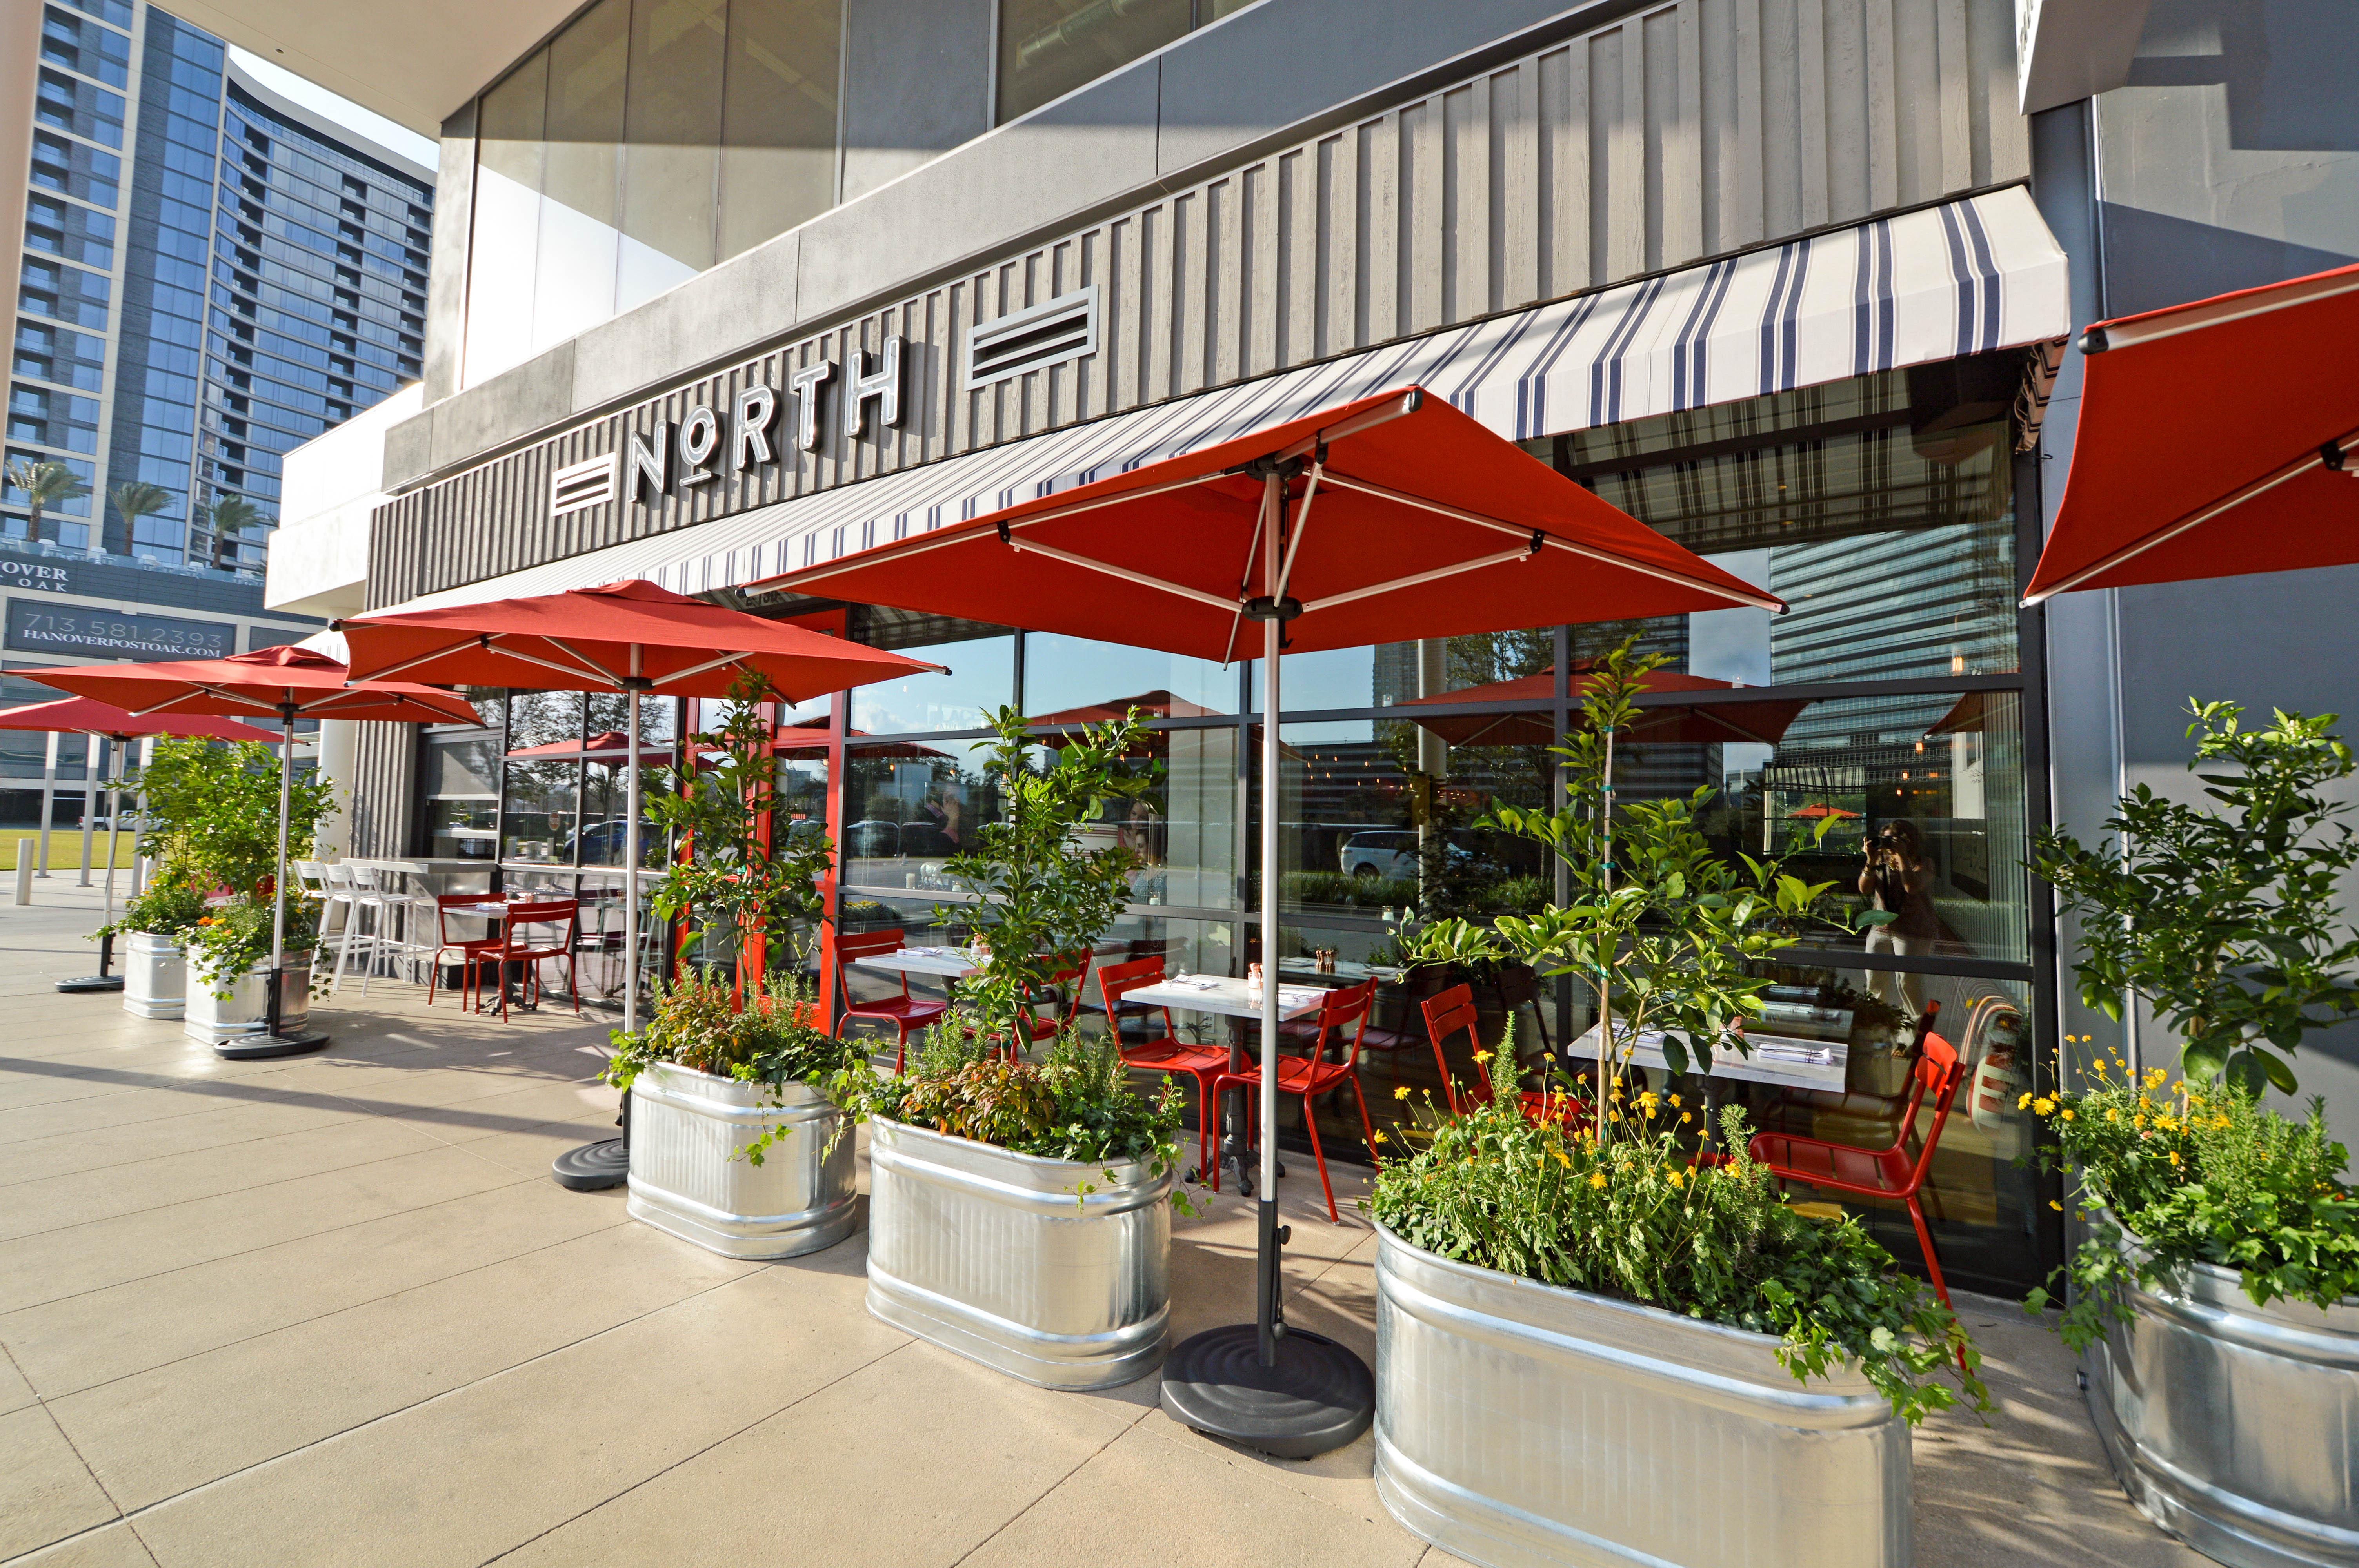 exterior view of Italian restaurant